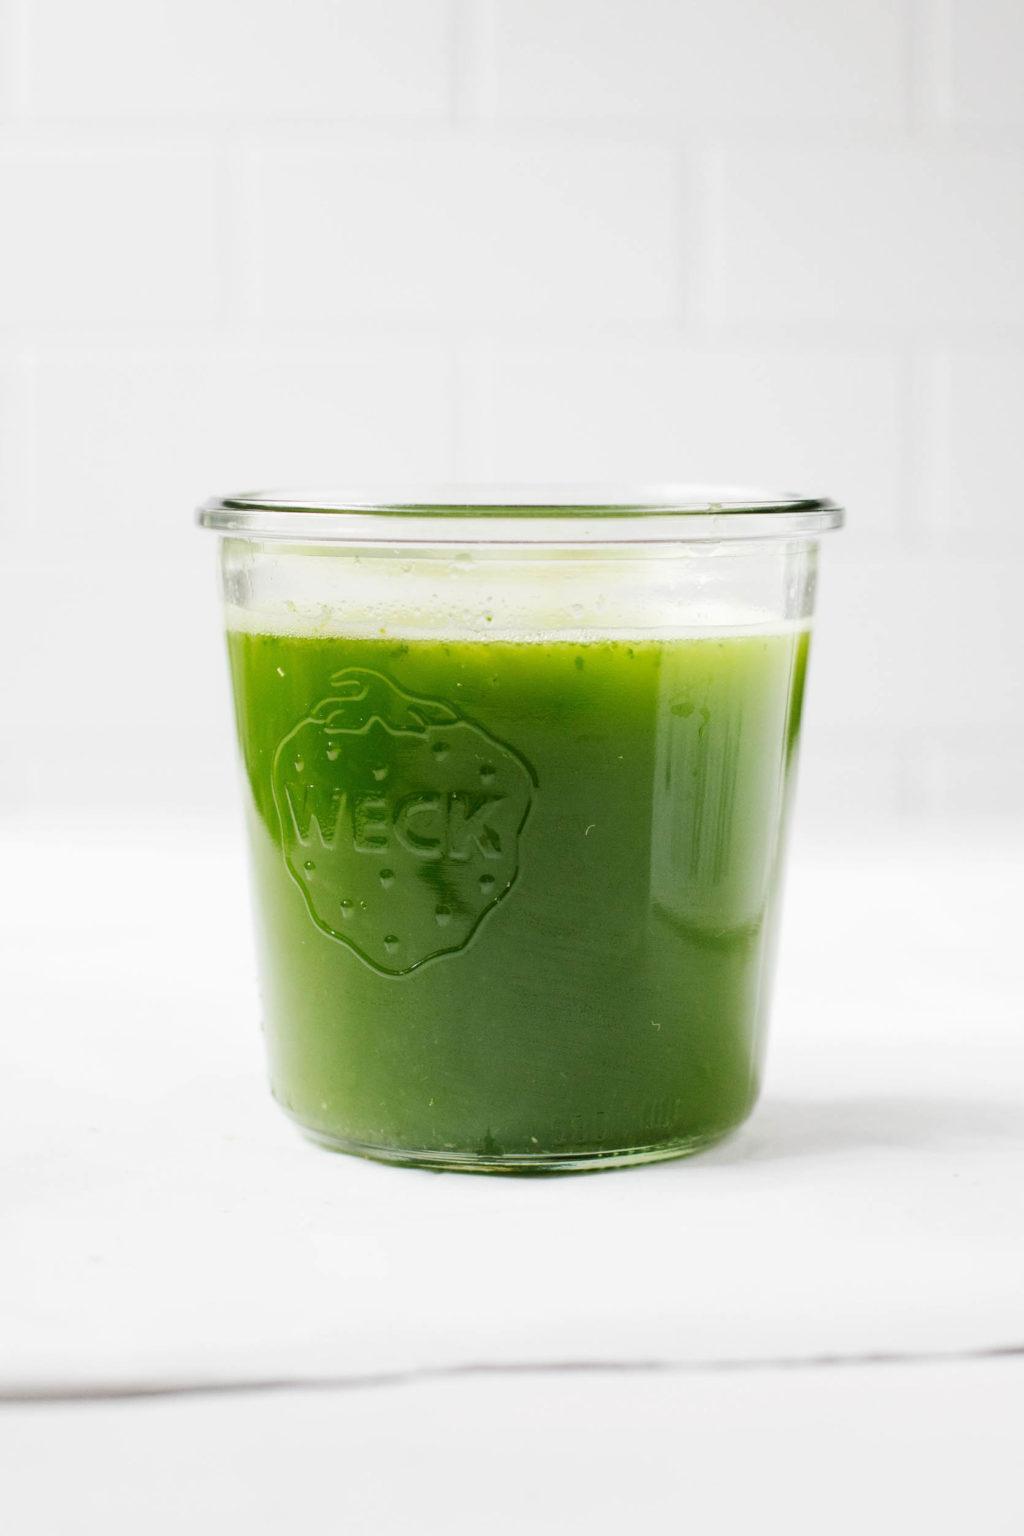 A Weck mason jar holds a freshly made green juice.